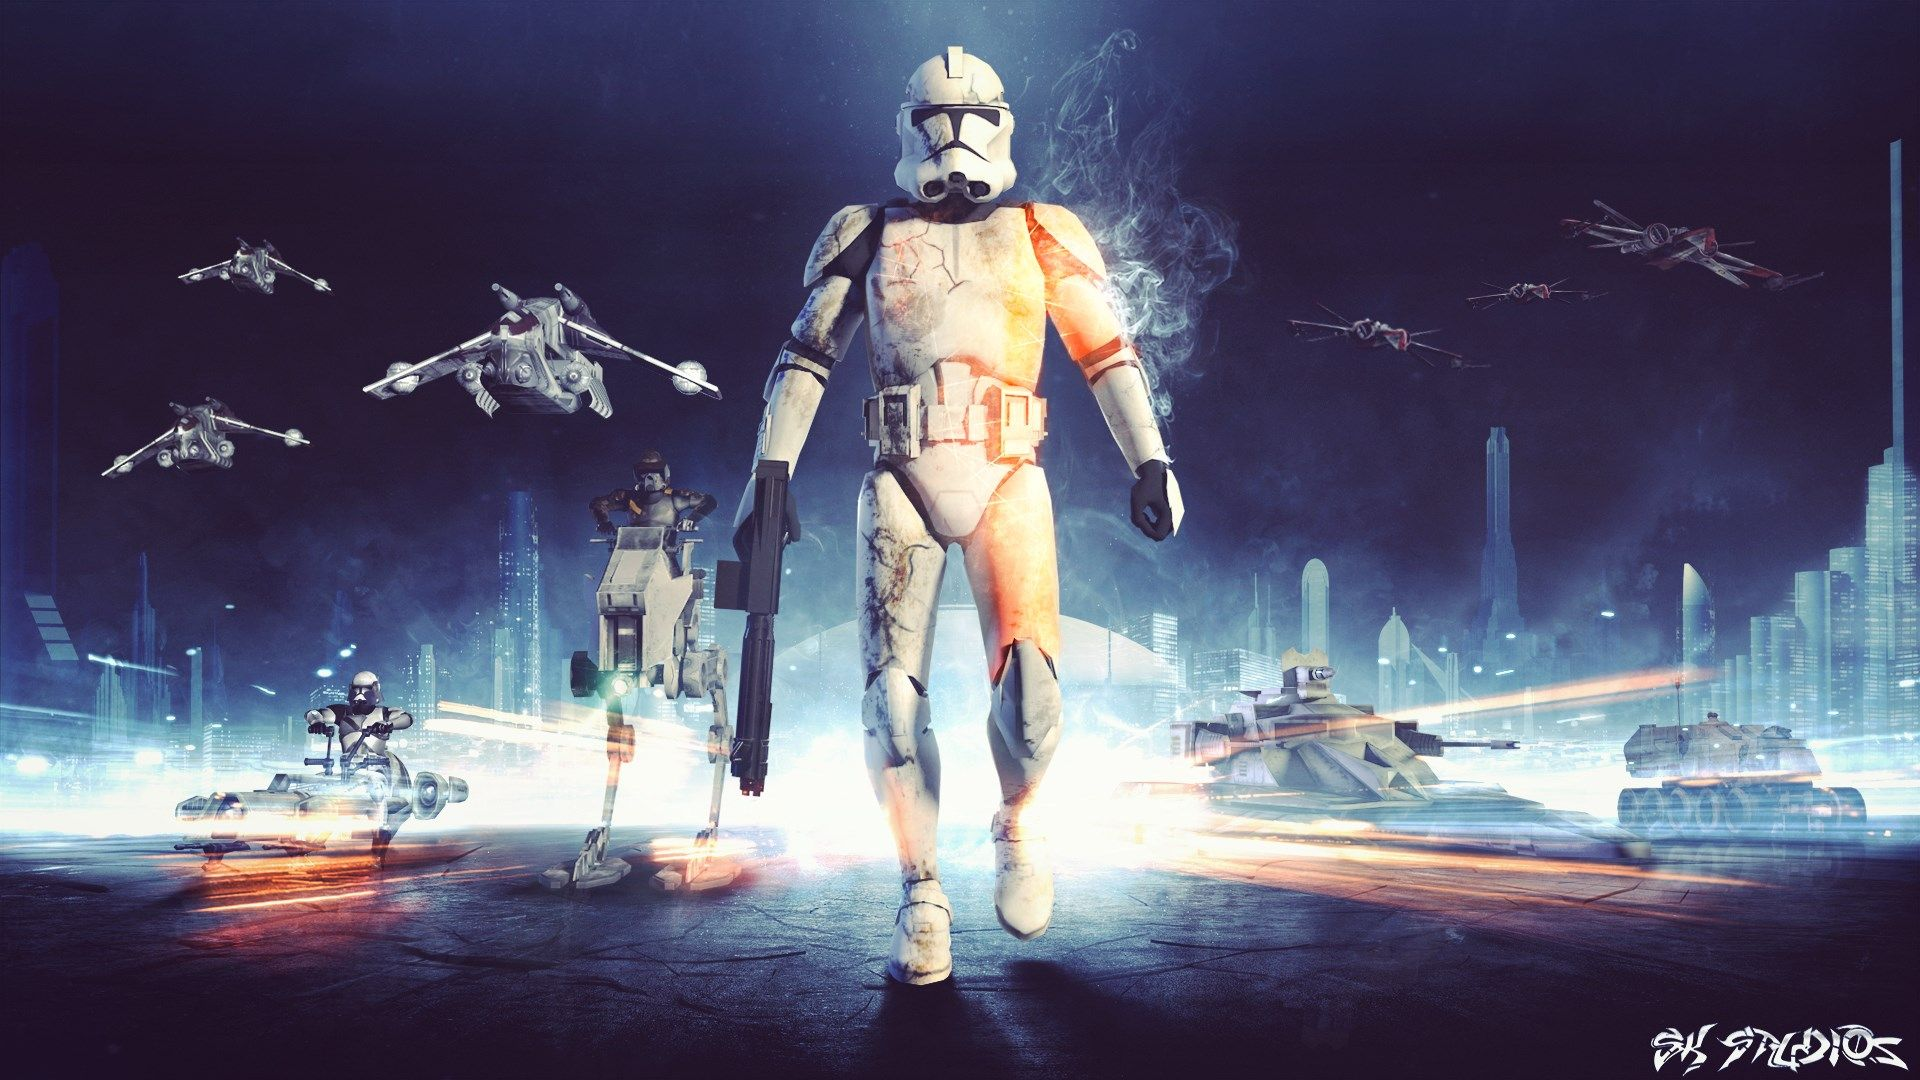 free desktop wallpaper downloads star wars battlefront (amanda